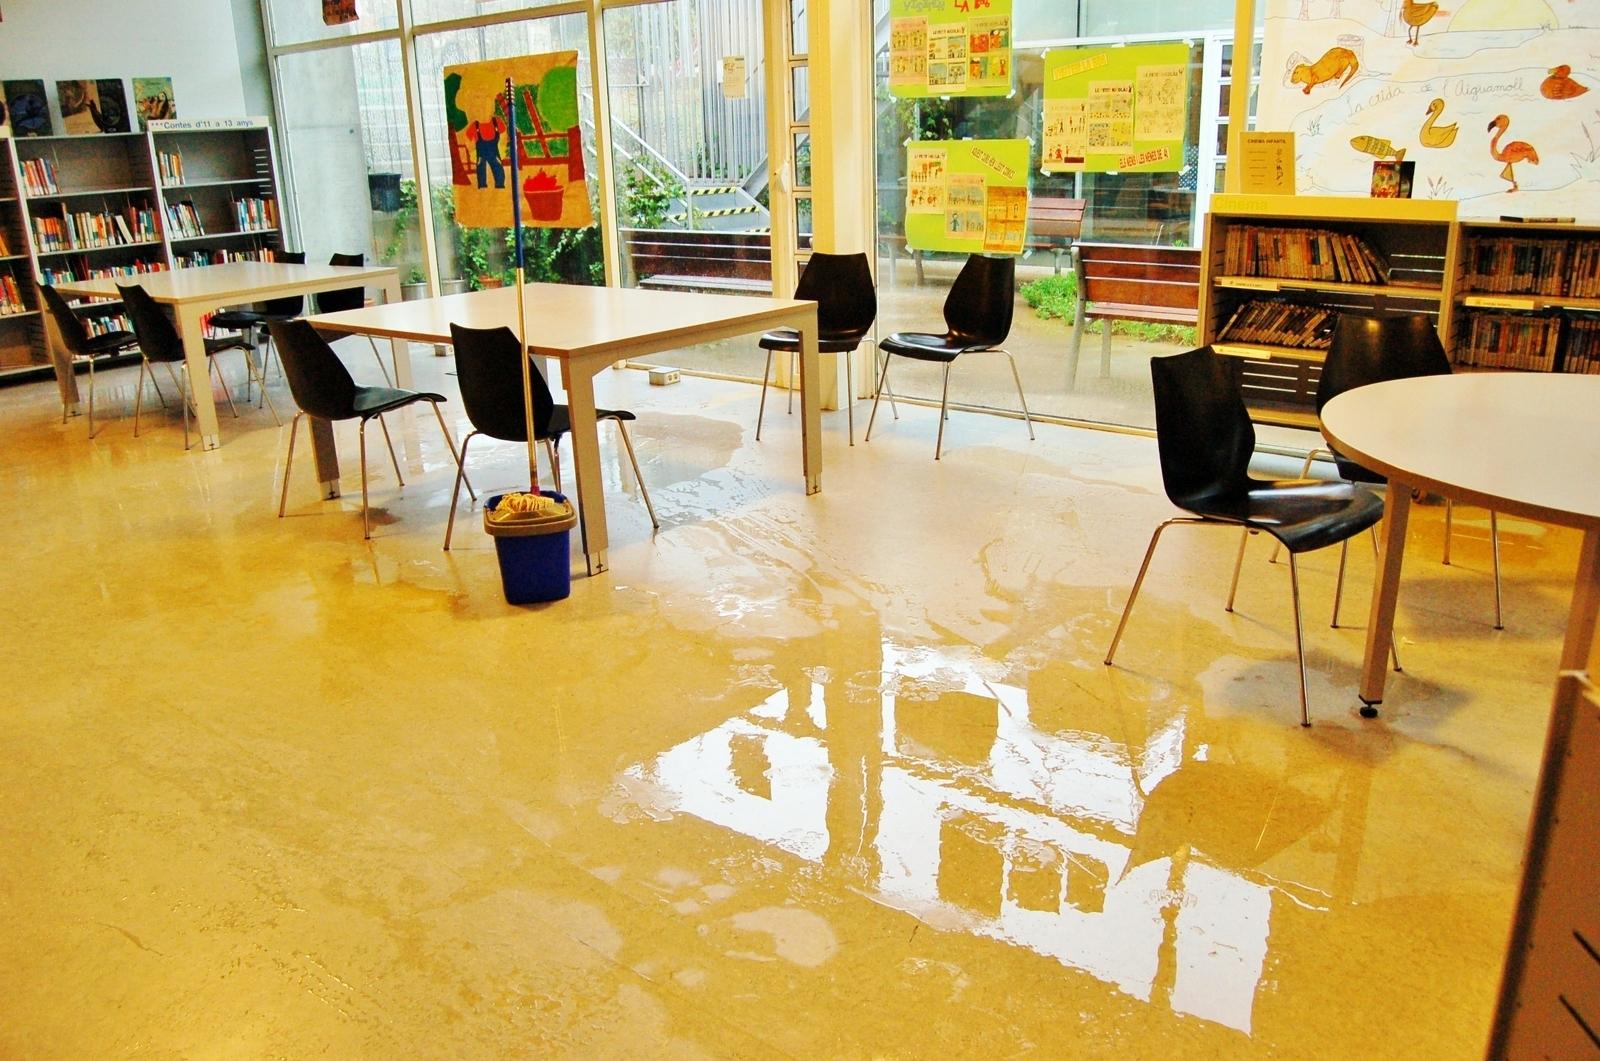 Inundada la BD6 a Terrassa